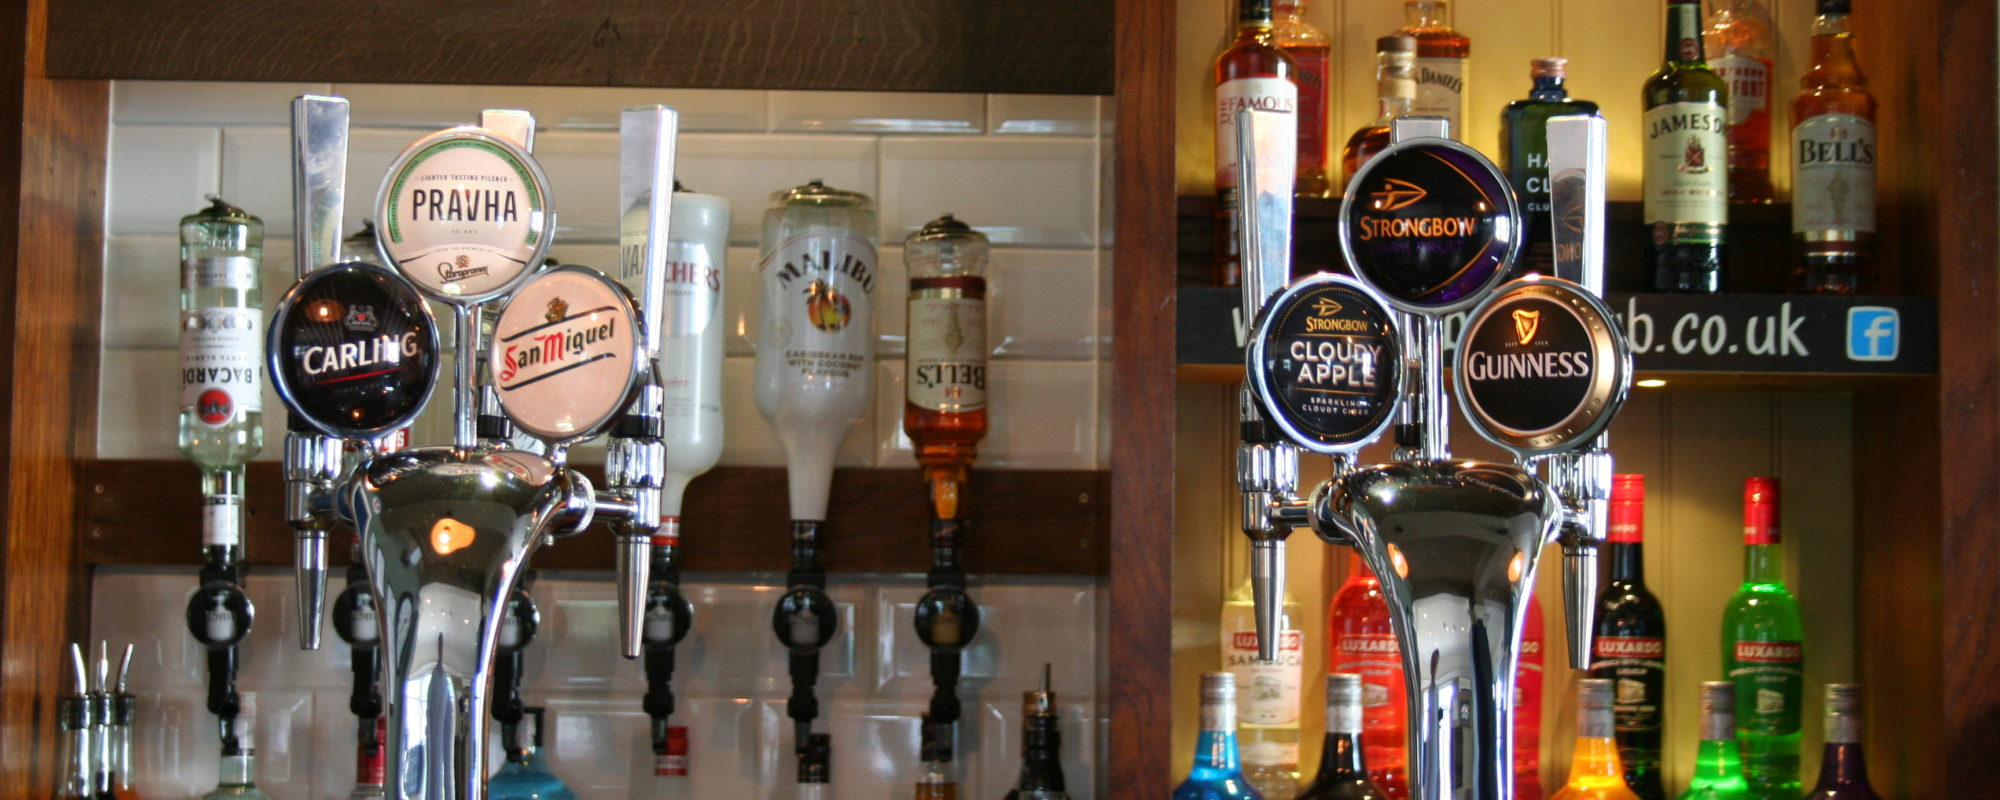 Handcrafted beers